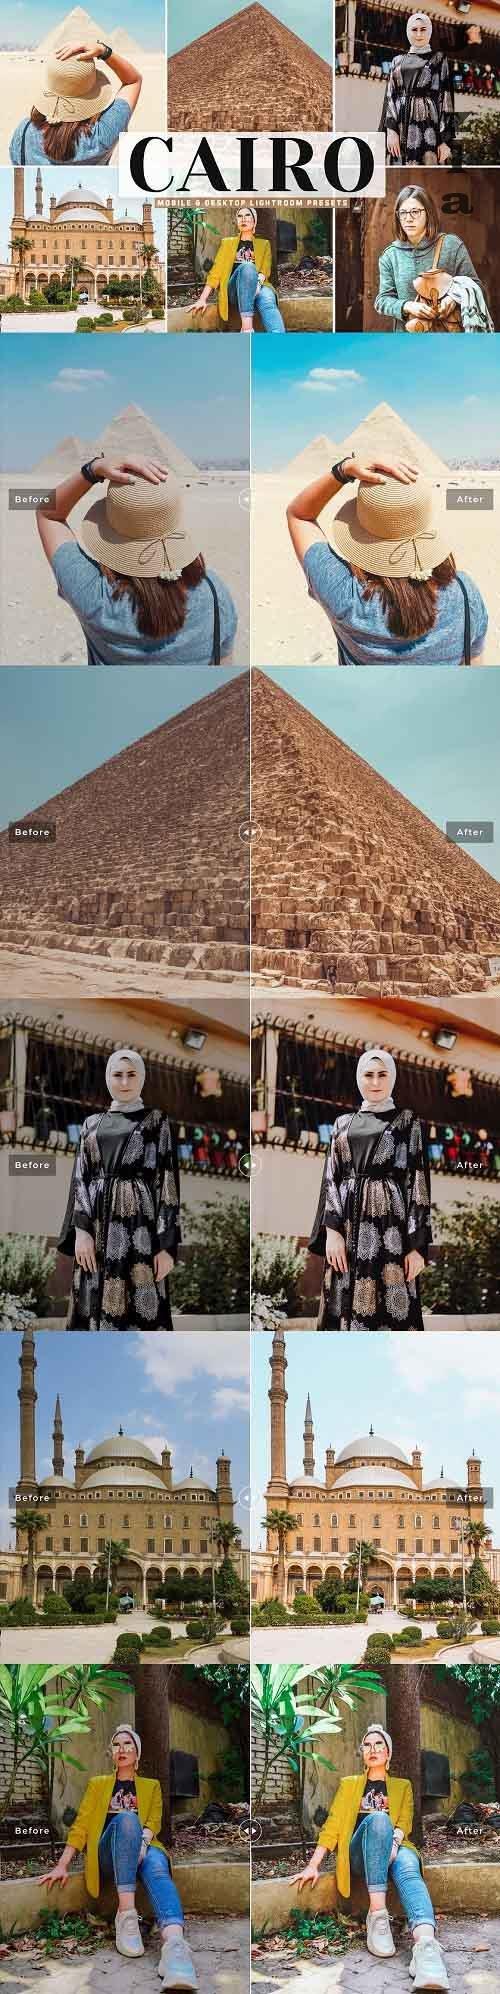 Cairo Pro Lightroom Presets - 5479378 - Mobile & Desktop